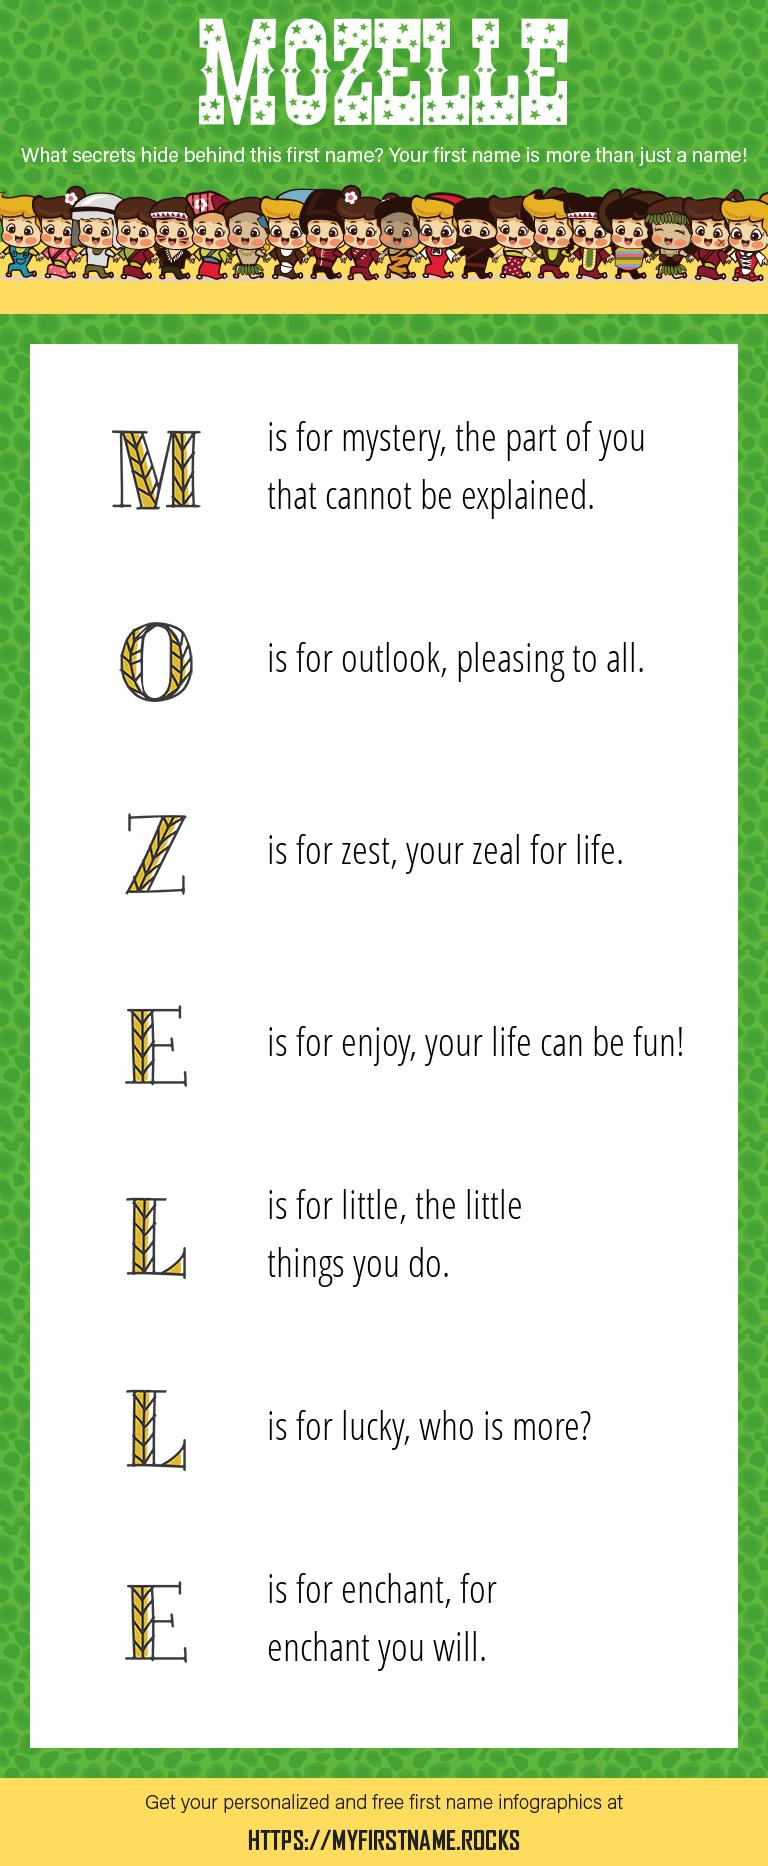 Mozelle Infographics